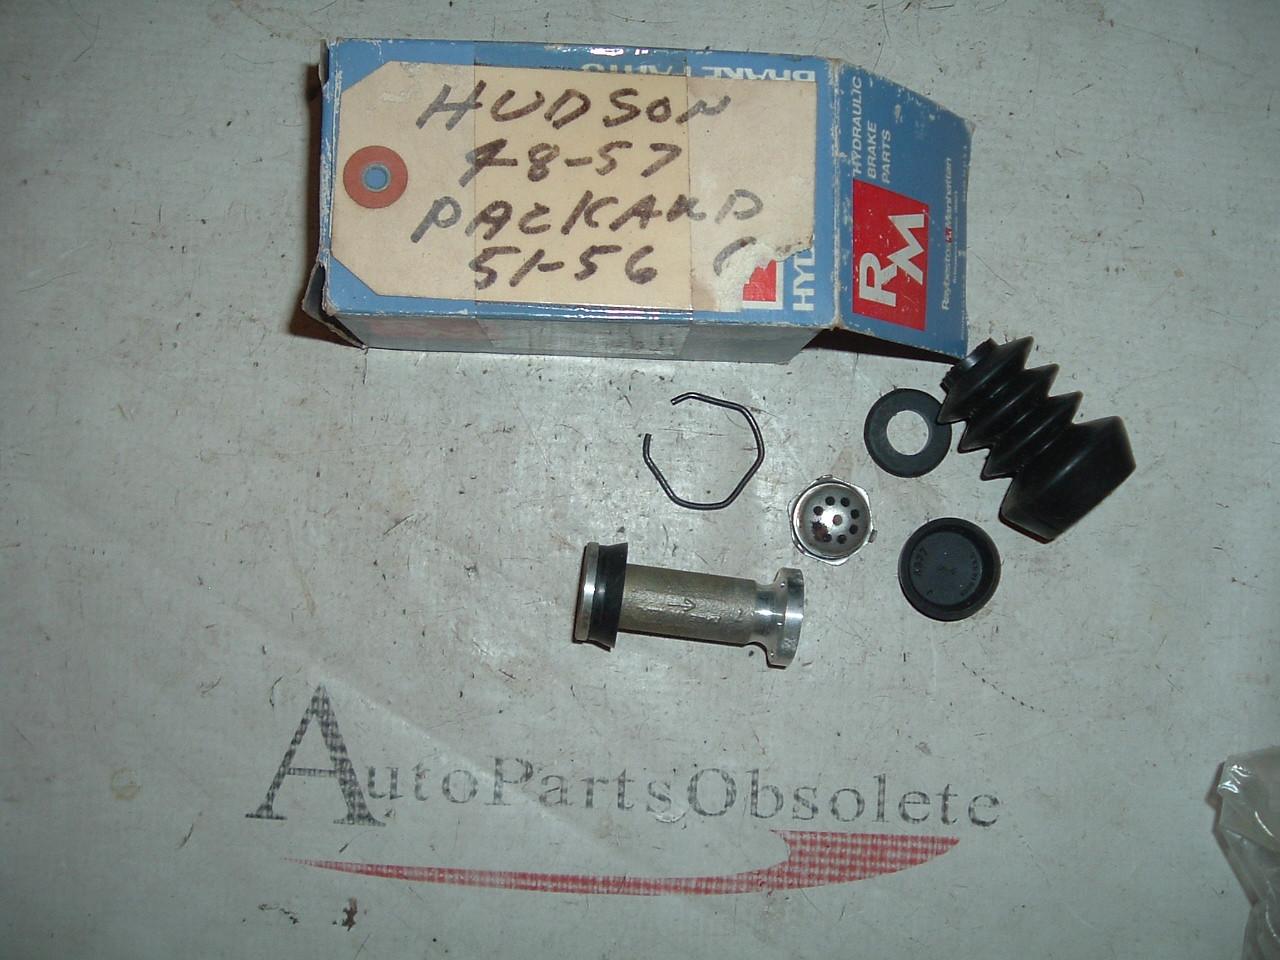 1948 49 50 51 52 53 54 55 56 57 hudson packard master brake cylinder rebuild kit (za mk138)